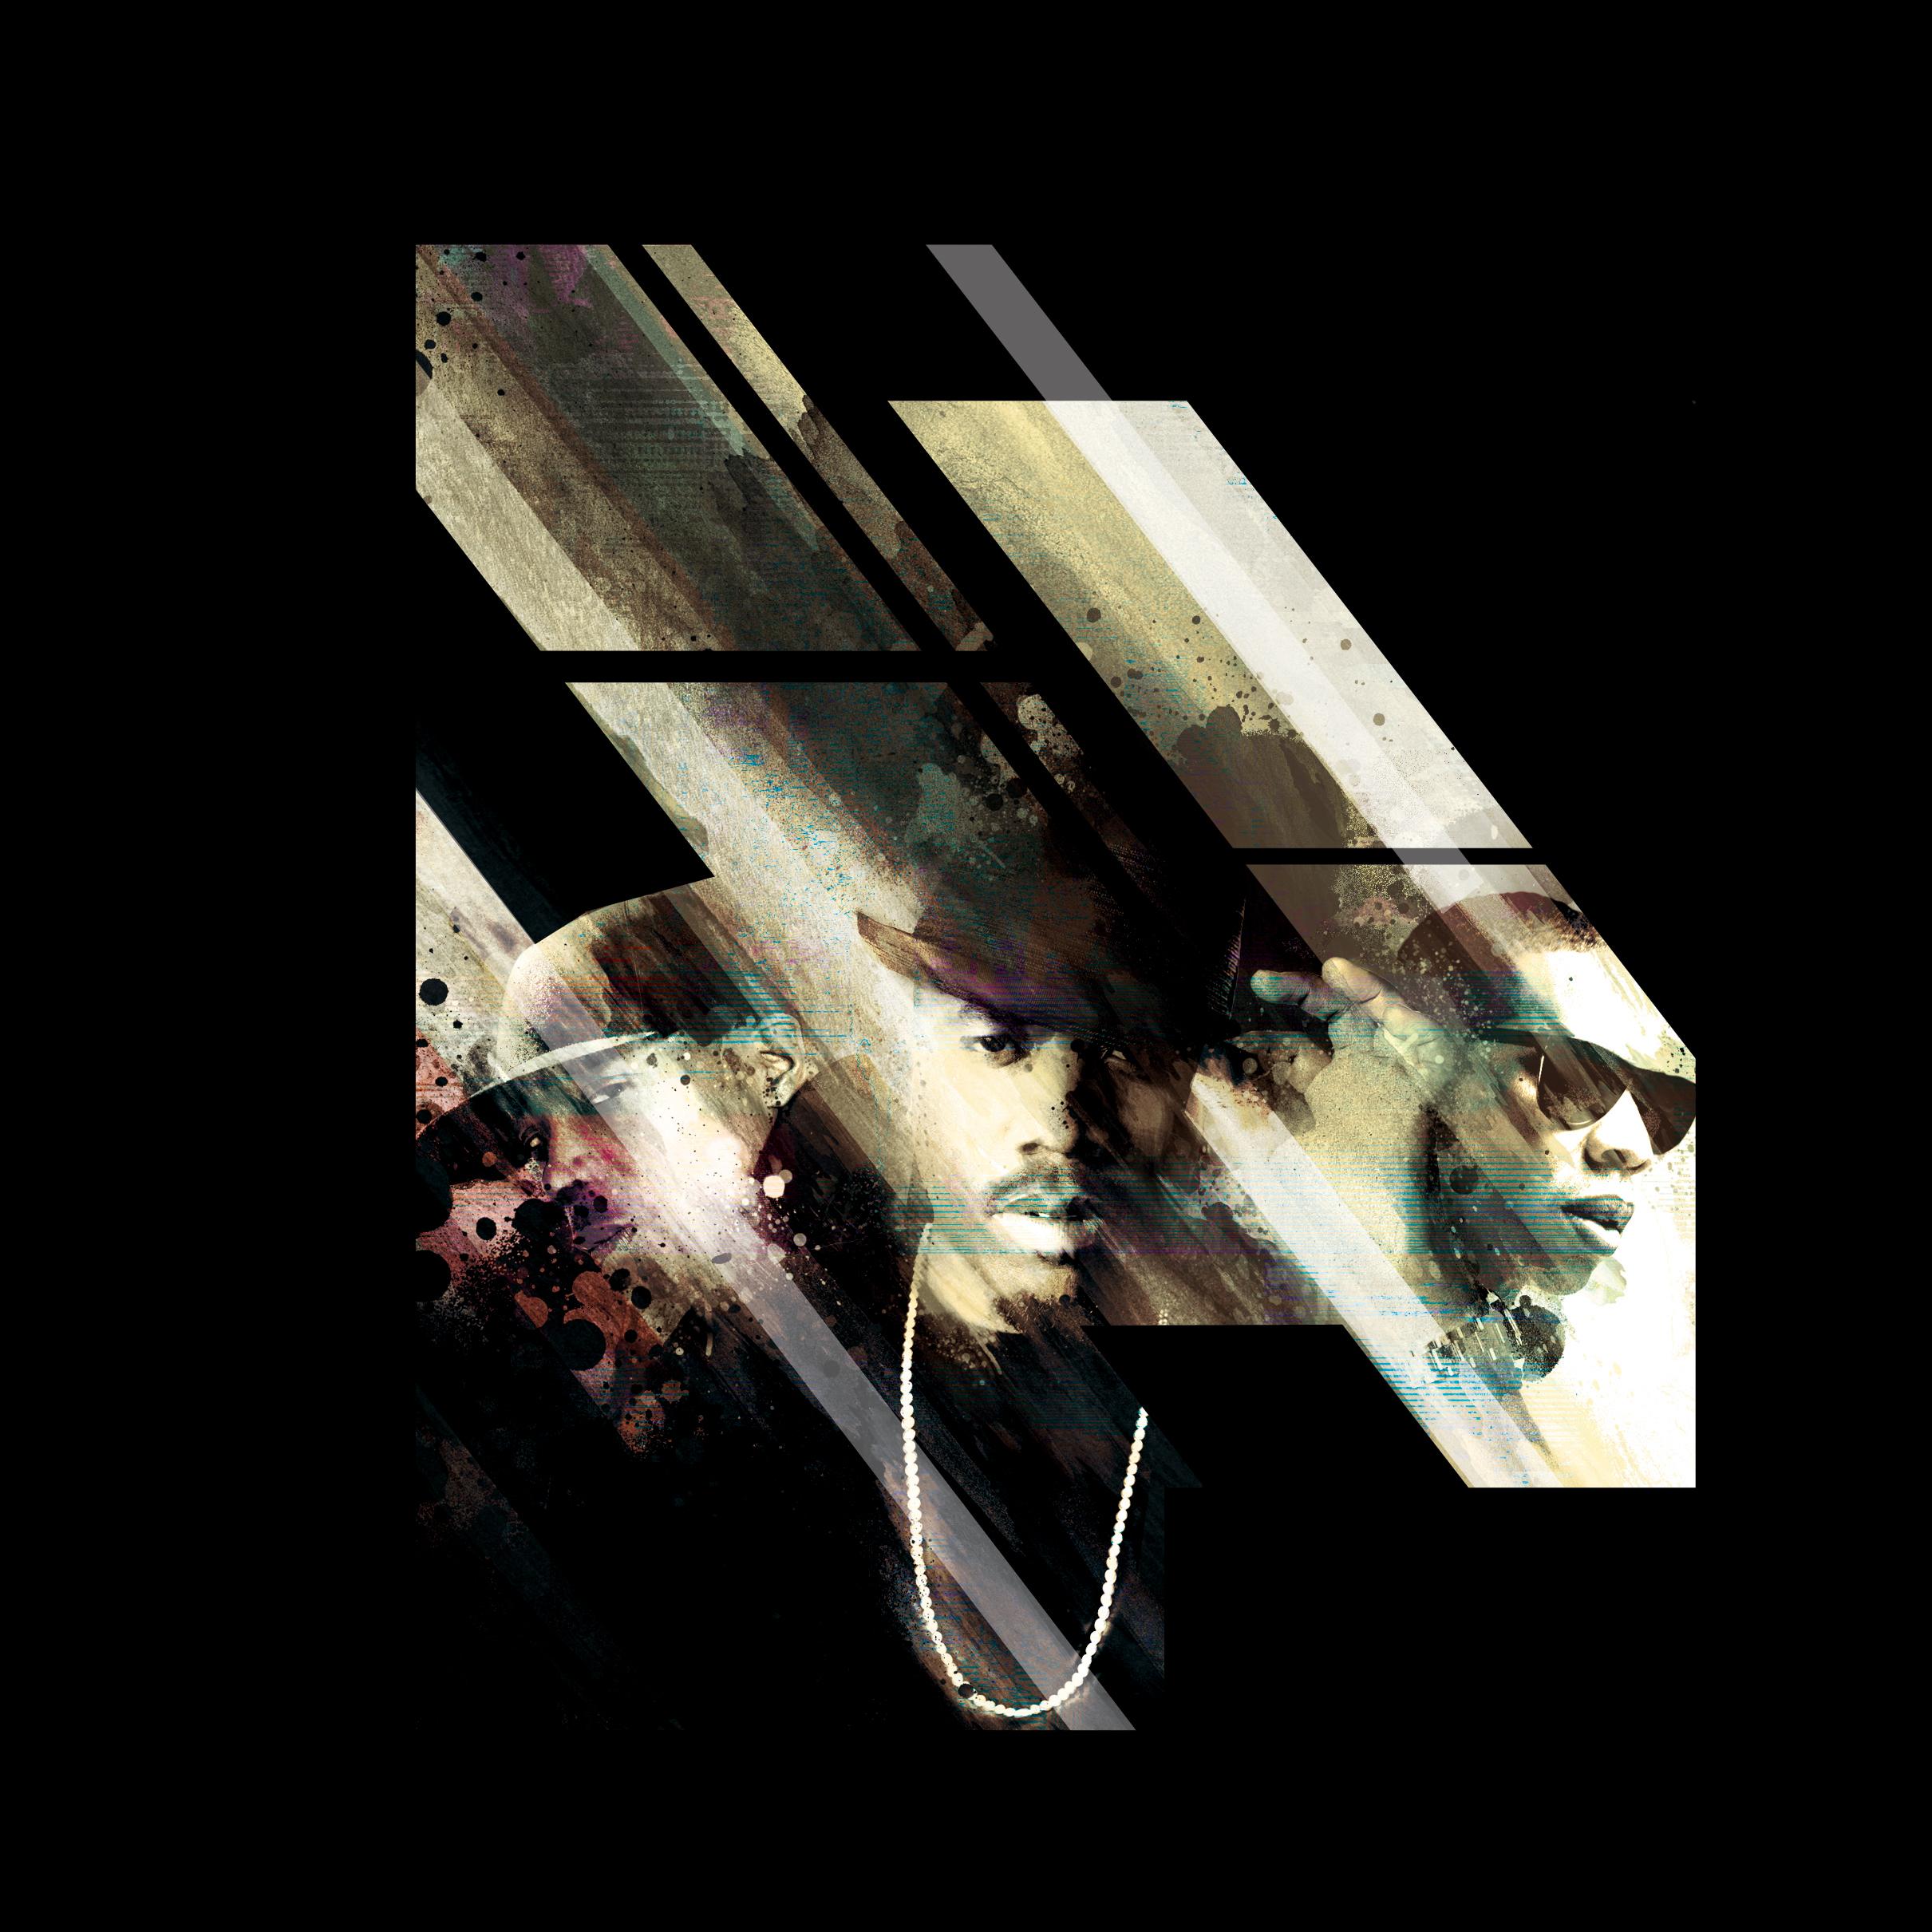 MUSIC NETWORK ILLUSTRATION - HIP HOP HYSTERIA